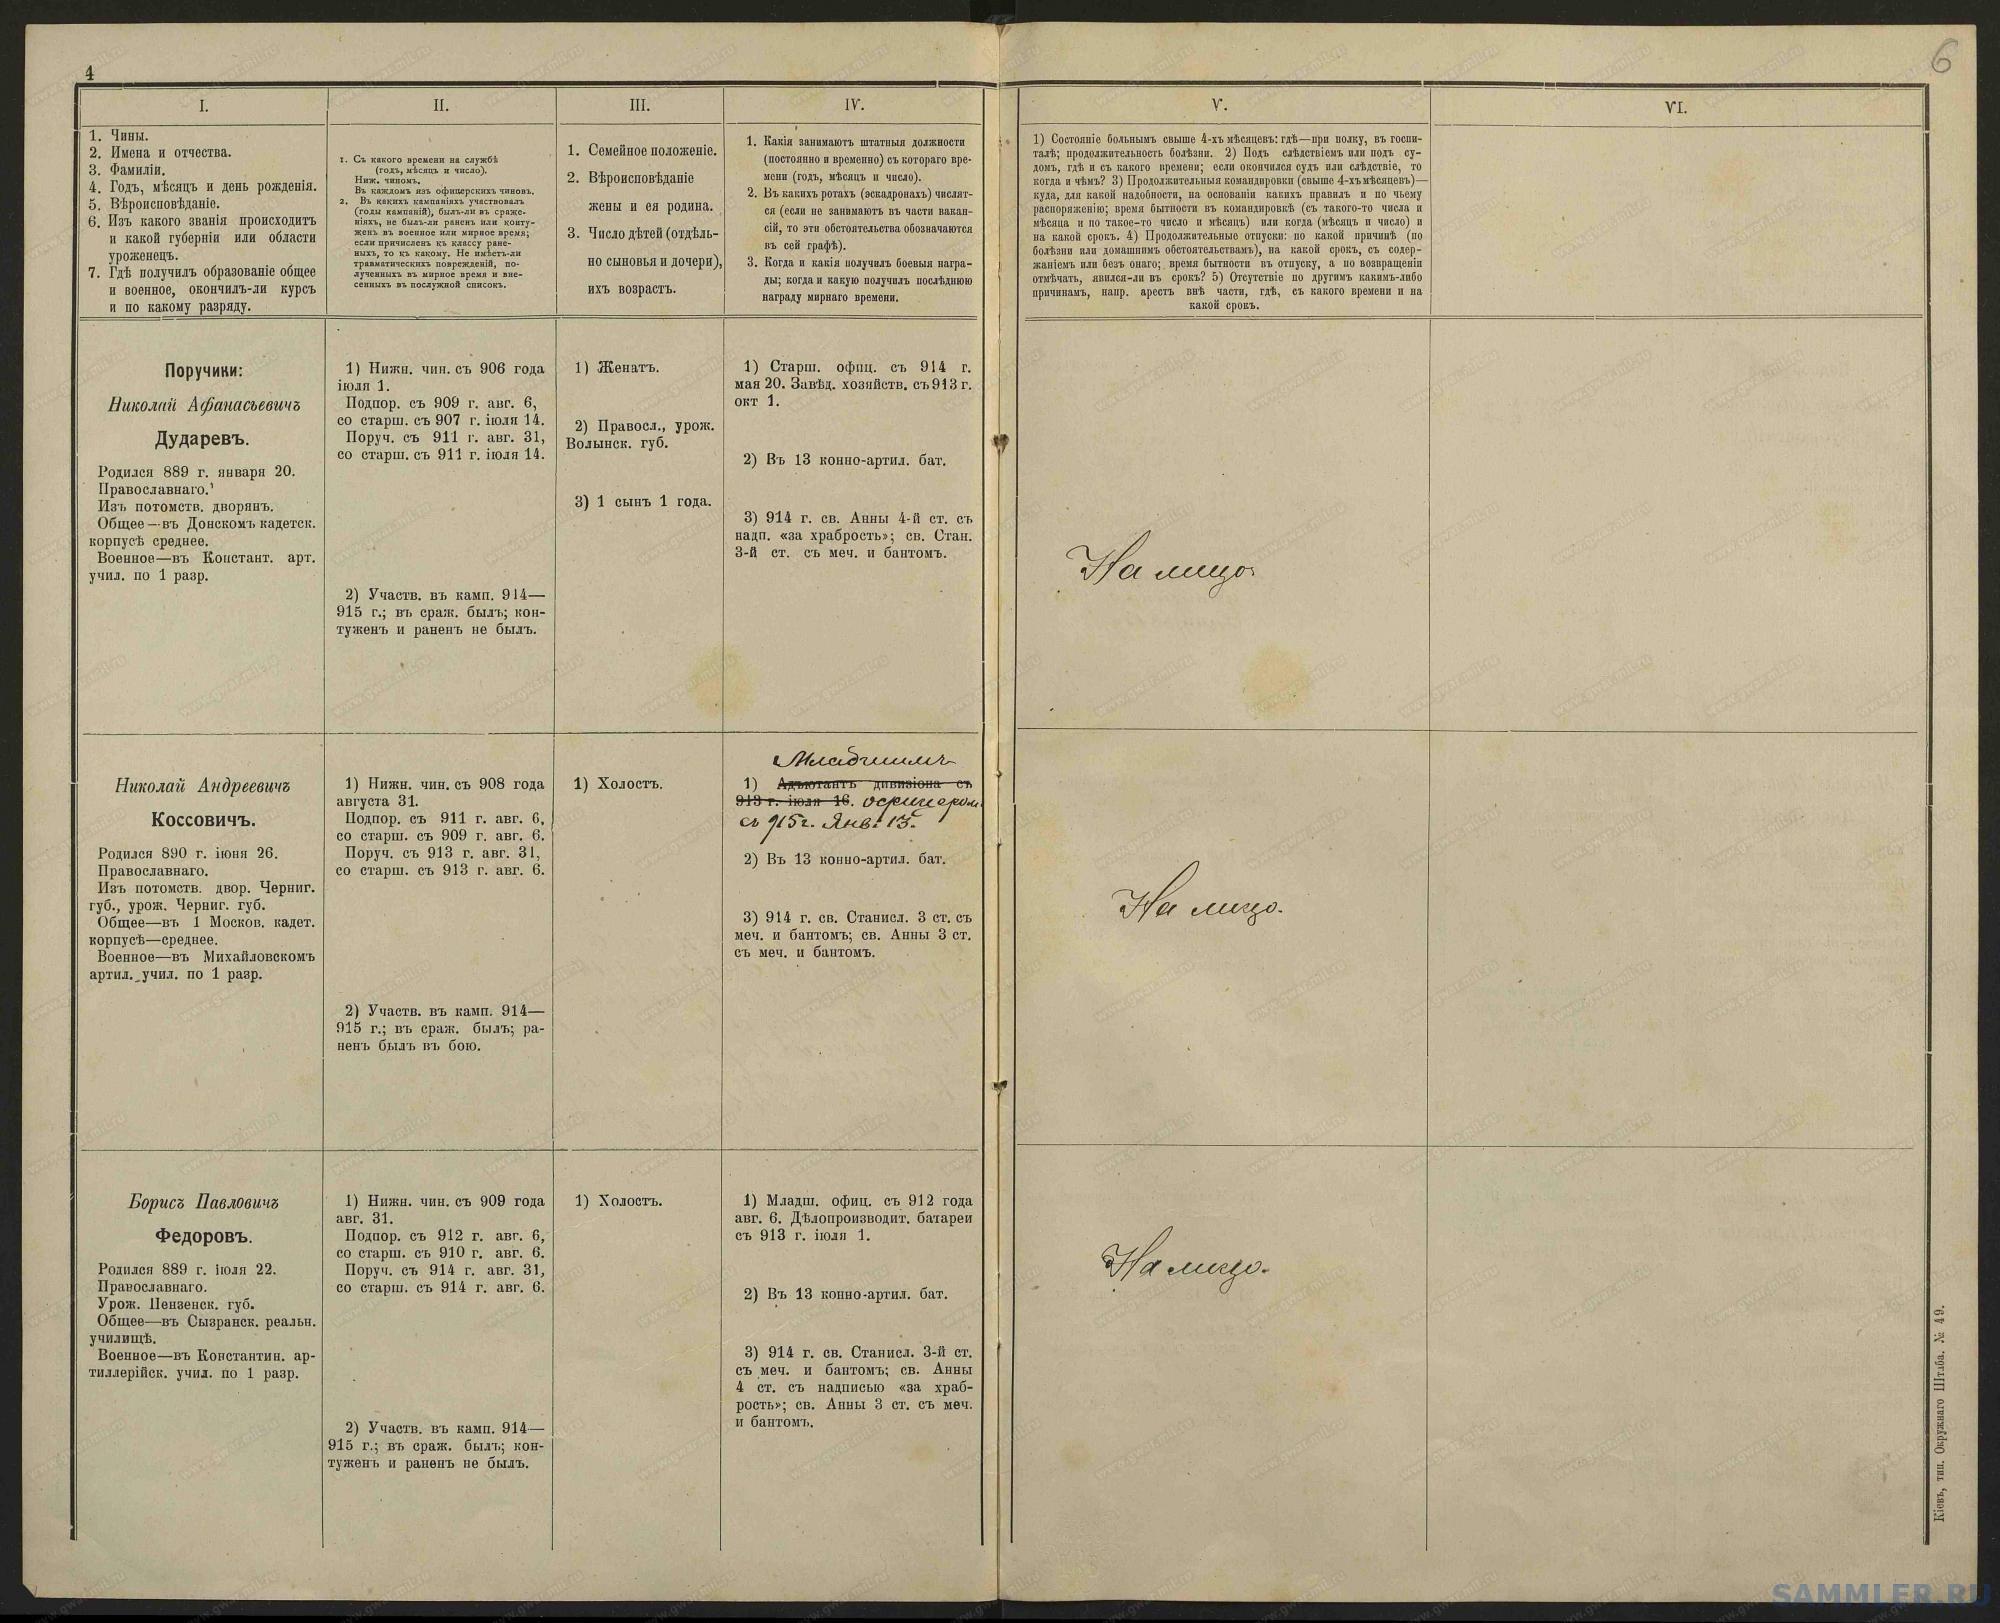 Список офицеров 7-го конно-артиллерийского дивизиона на 01.01.1915__07_.jpg